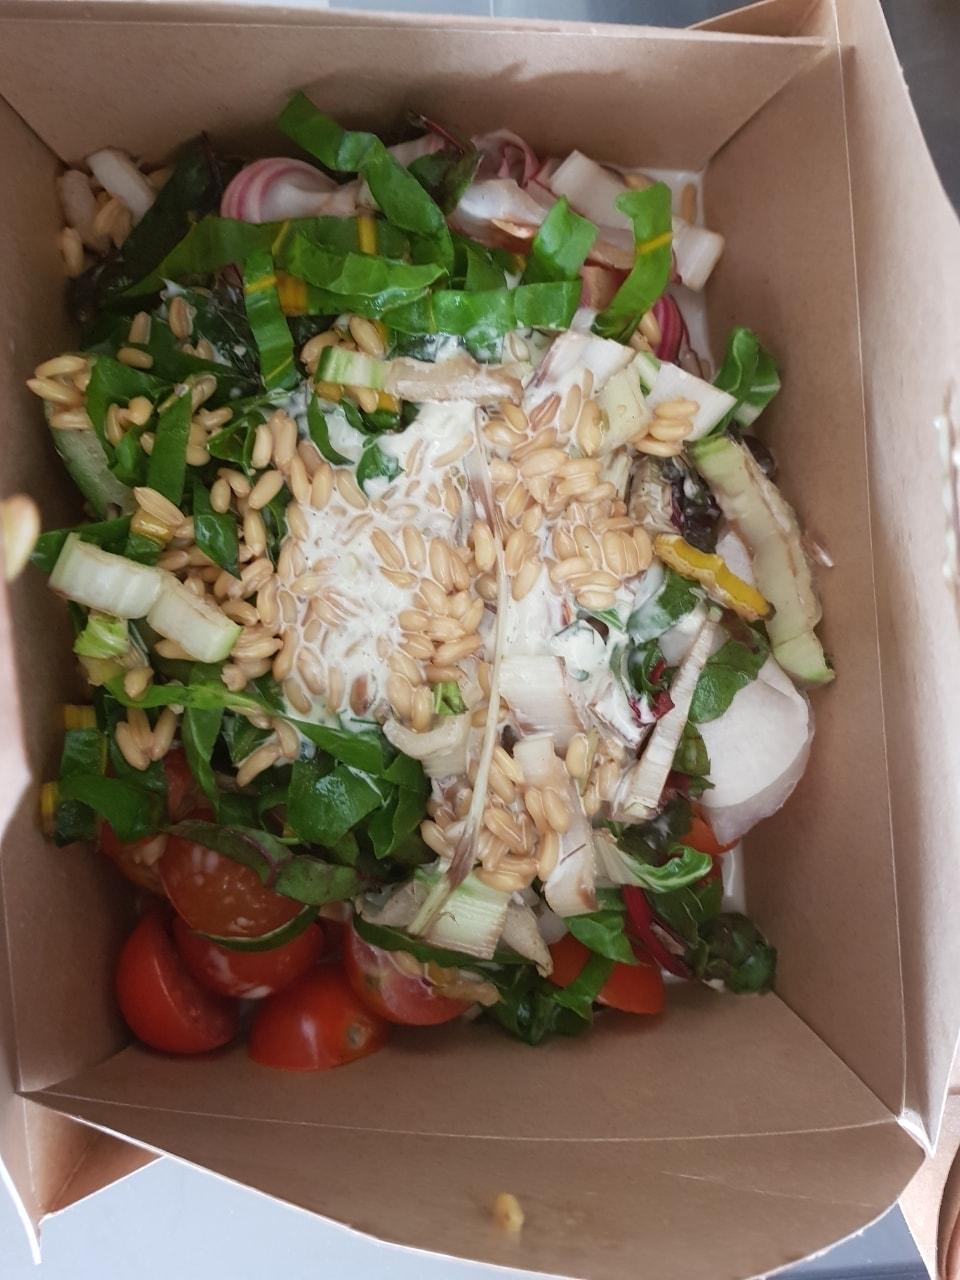 Large tasty salad from fotografiska!